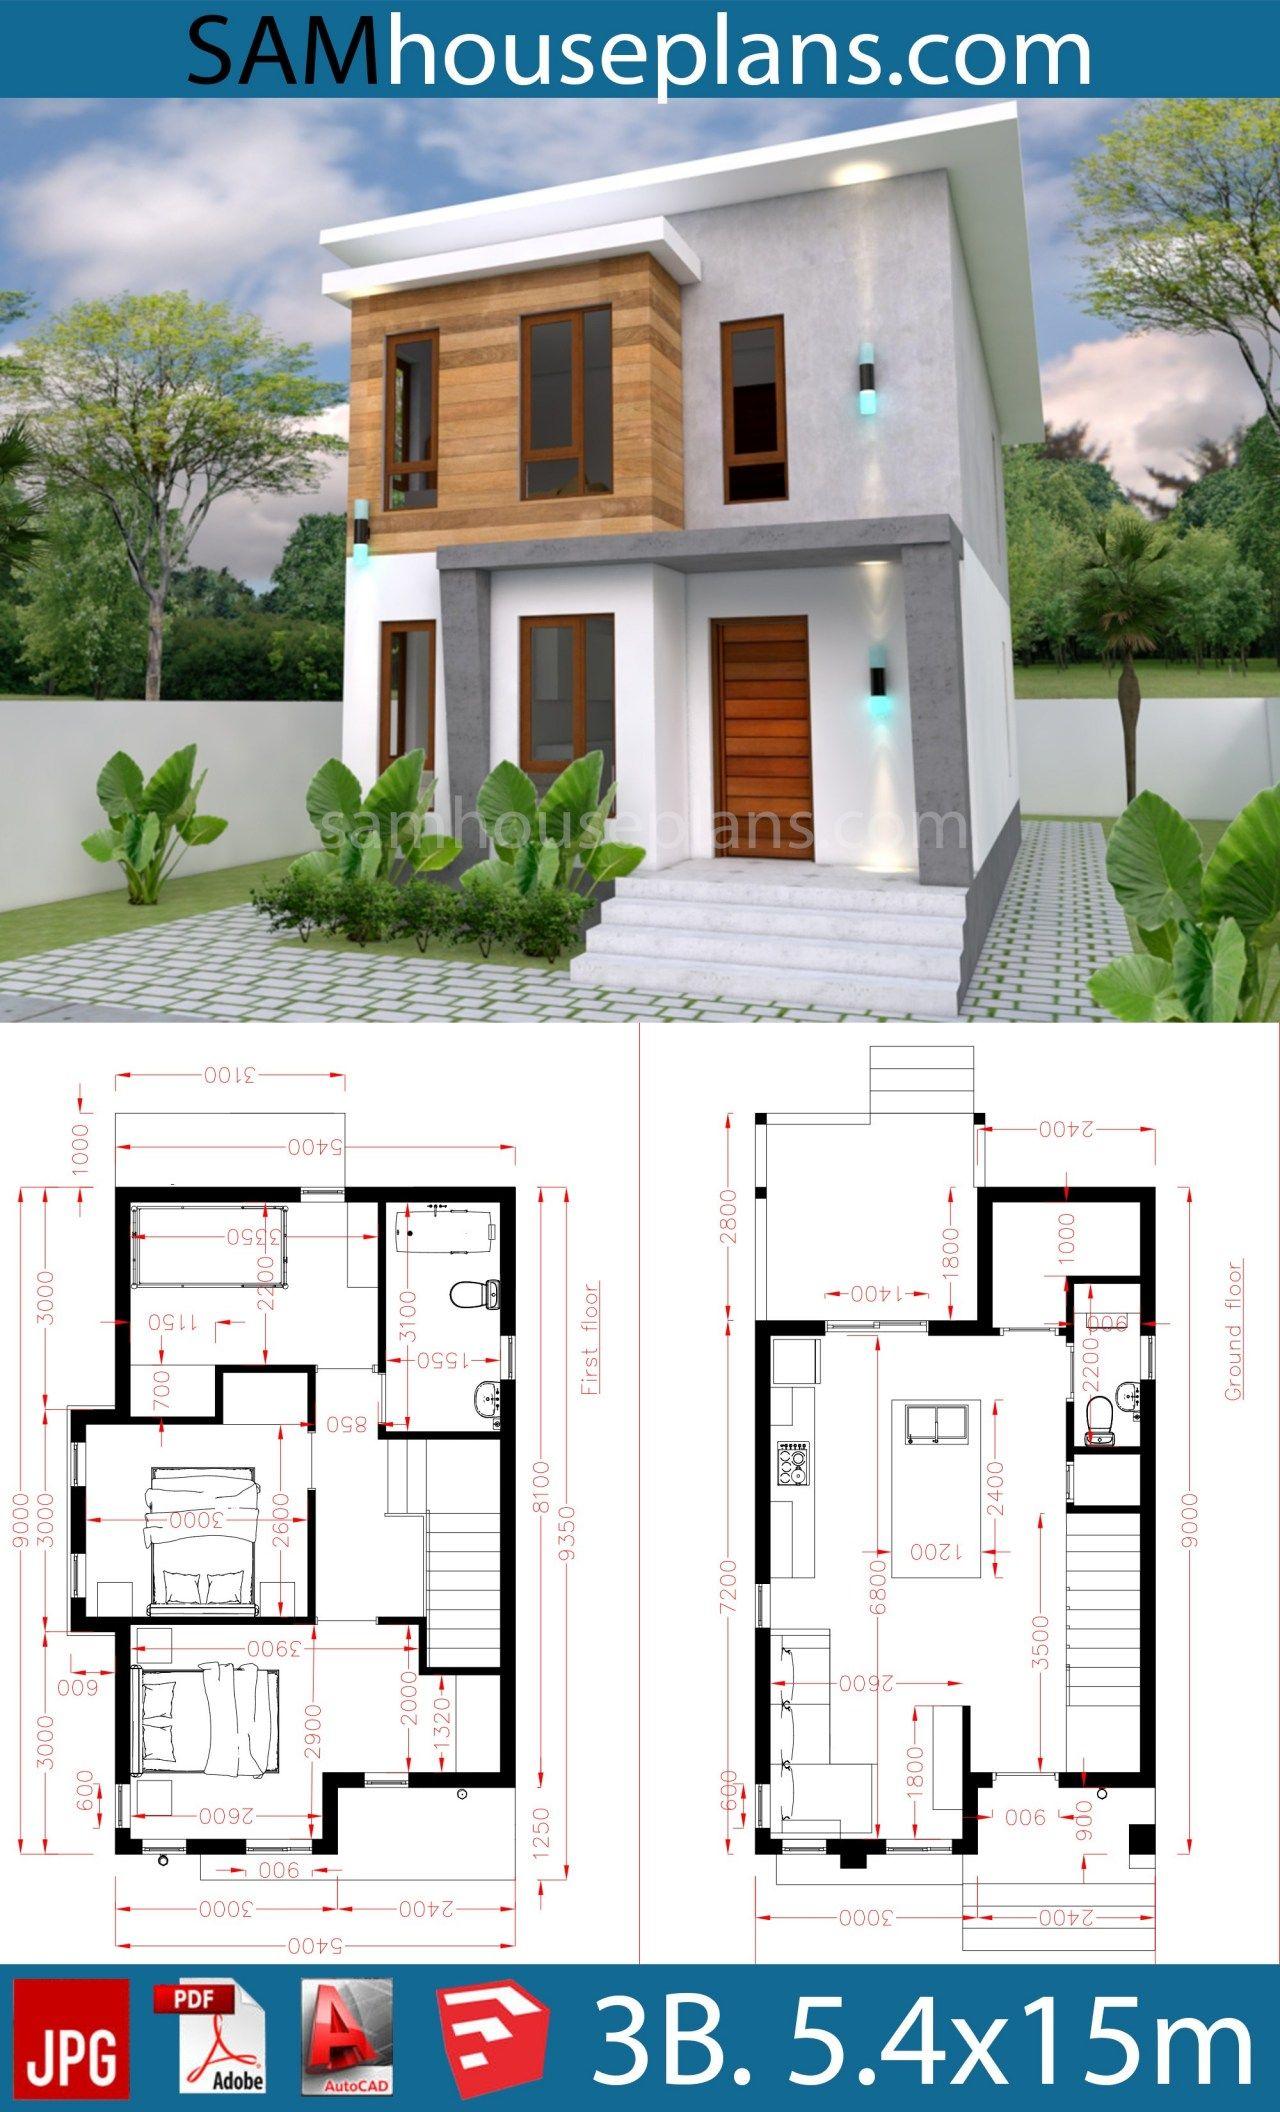 House Plans 5 4x10m With 3 Bedroom Sam House Plans Village House Design Model House Plan Architectural House Plans